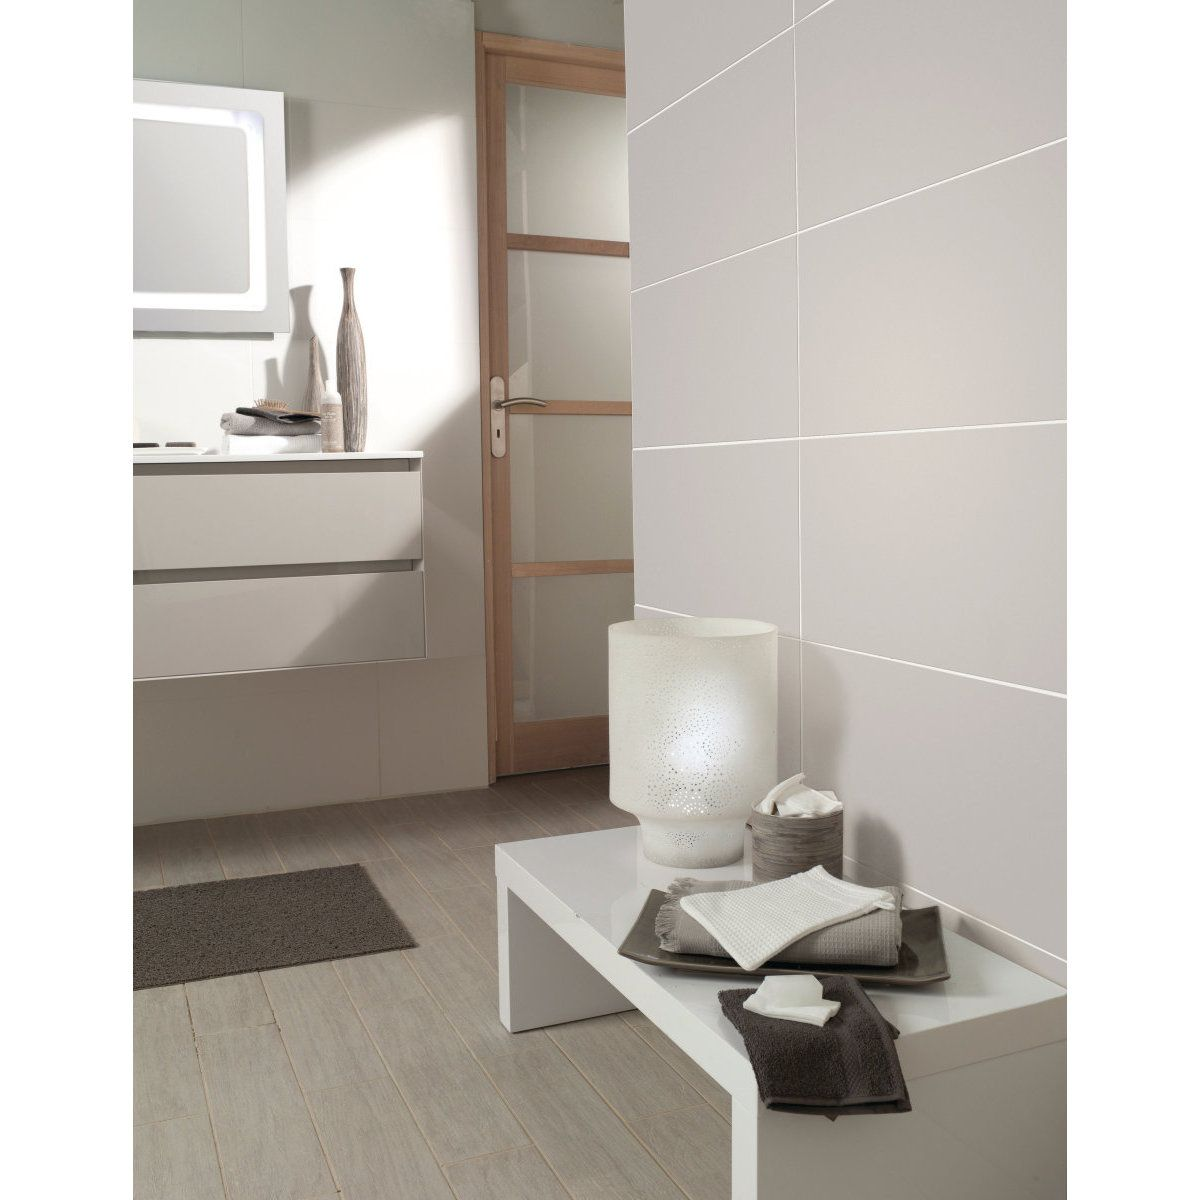 carrelage mural fa ence les exclusifs cristal gris lustr. Black Bedroom Furniture Sets. Home Design Ideas